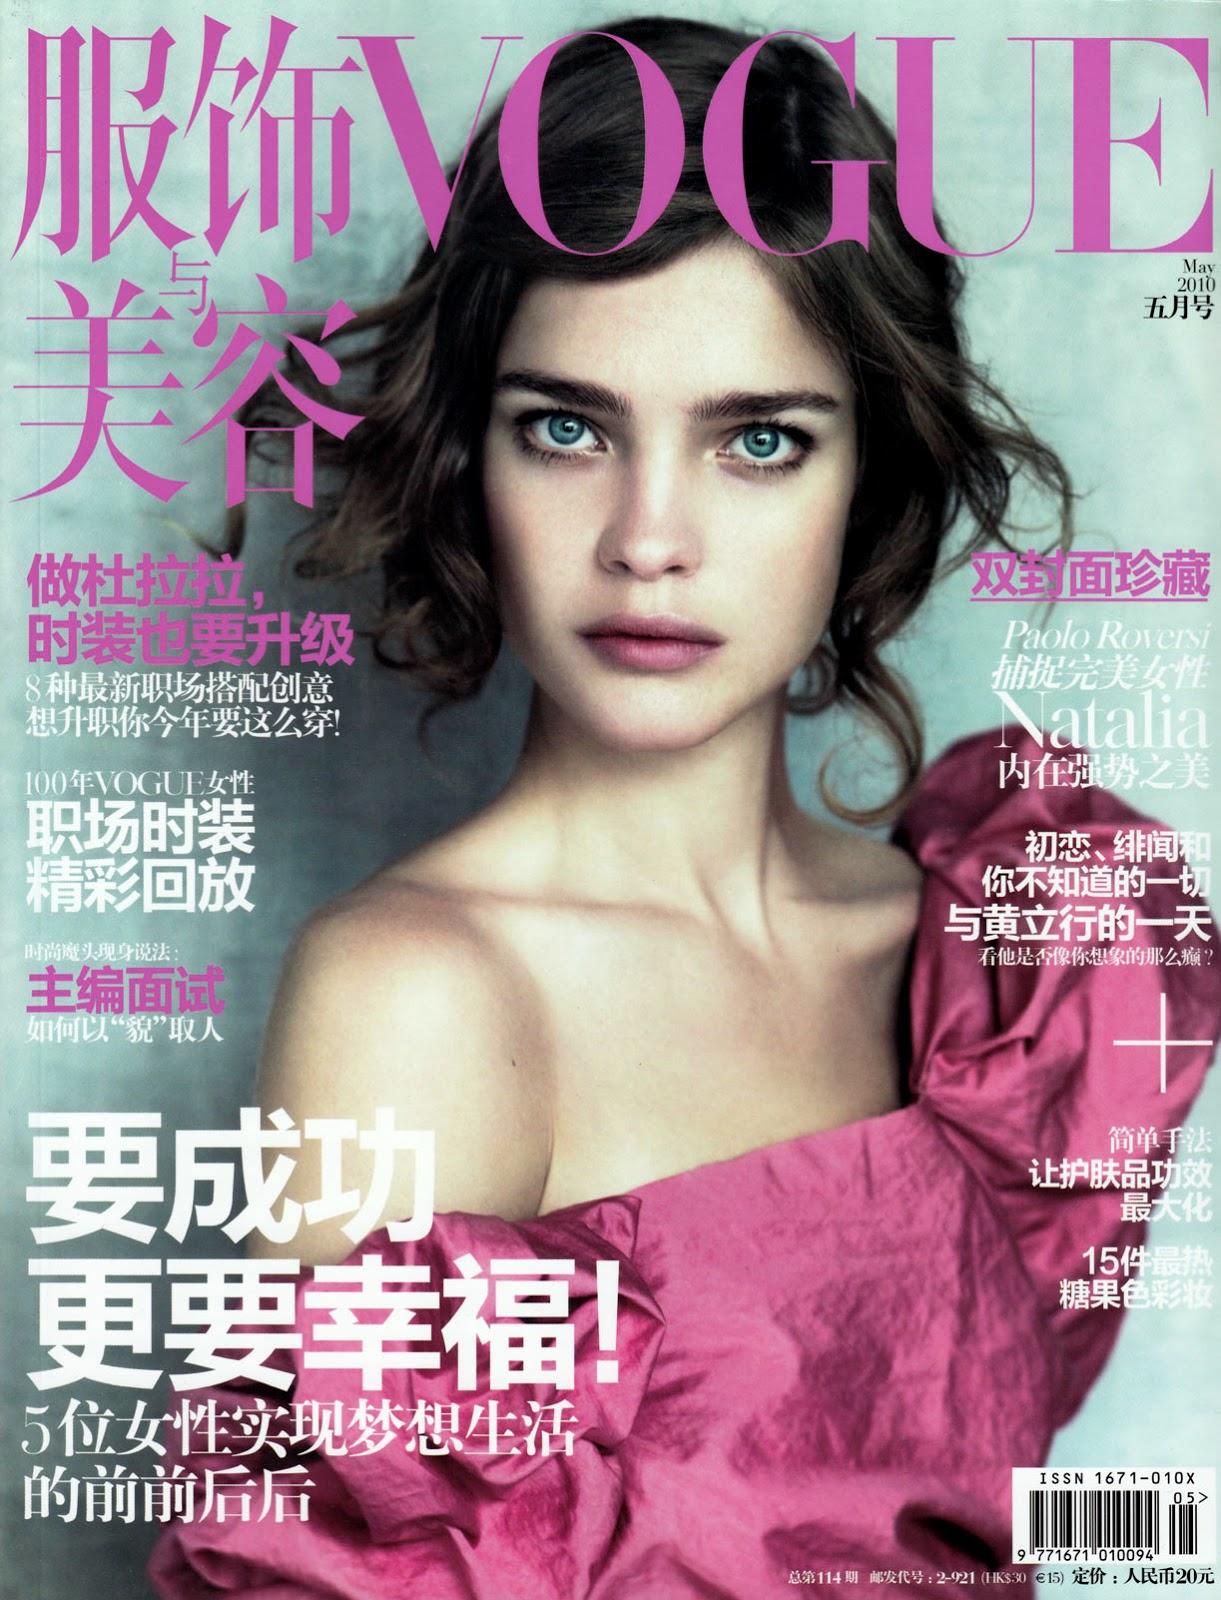 Natalia Vodianova by Paolo Roversi for Vogue China May 2010